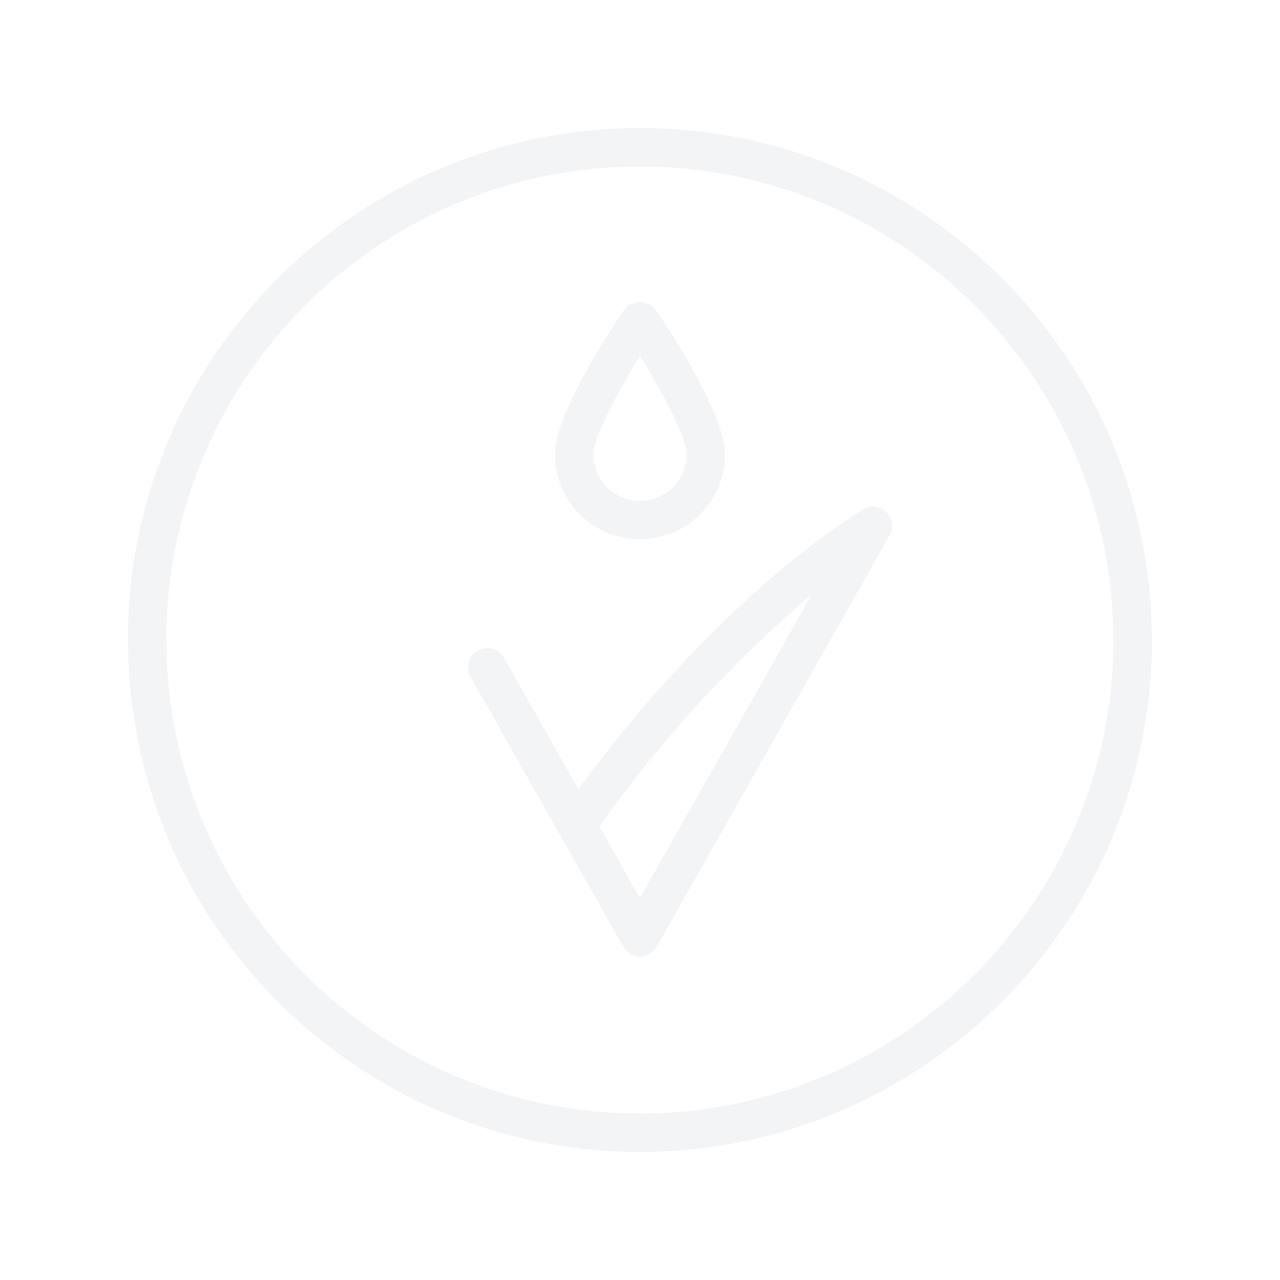 Everyday Minerals Concealer 1.7g